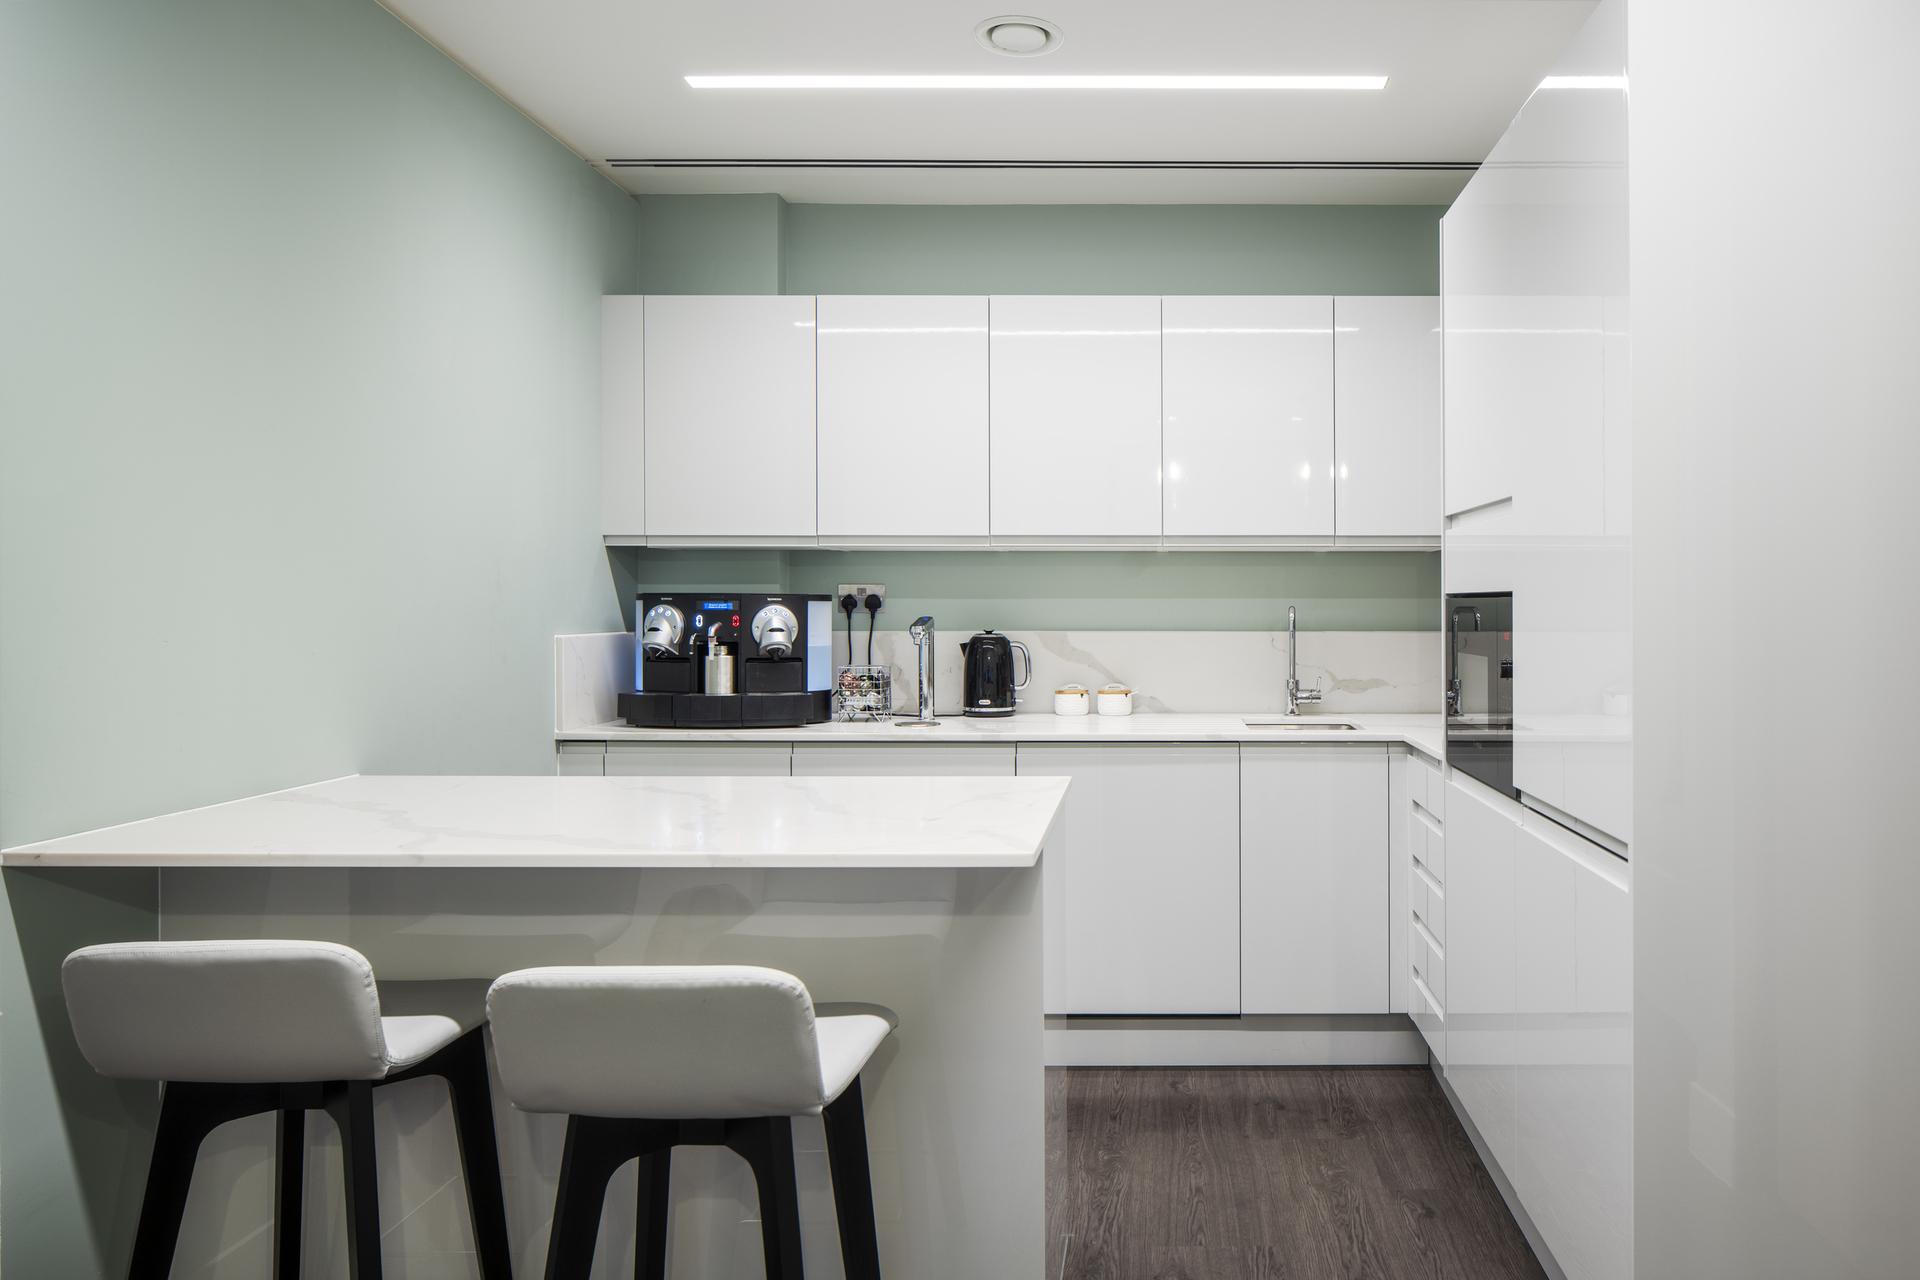 Chrystal Capital Office Kitchen